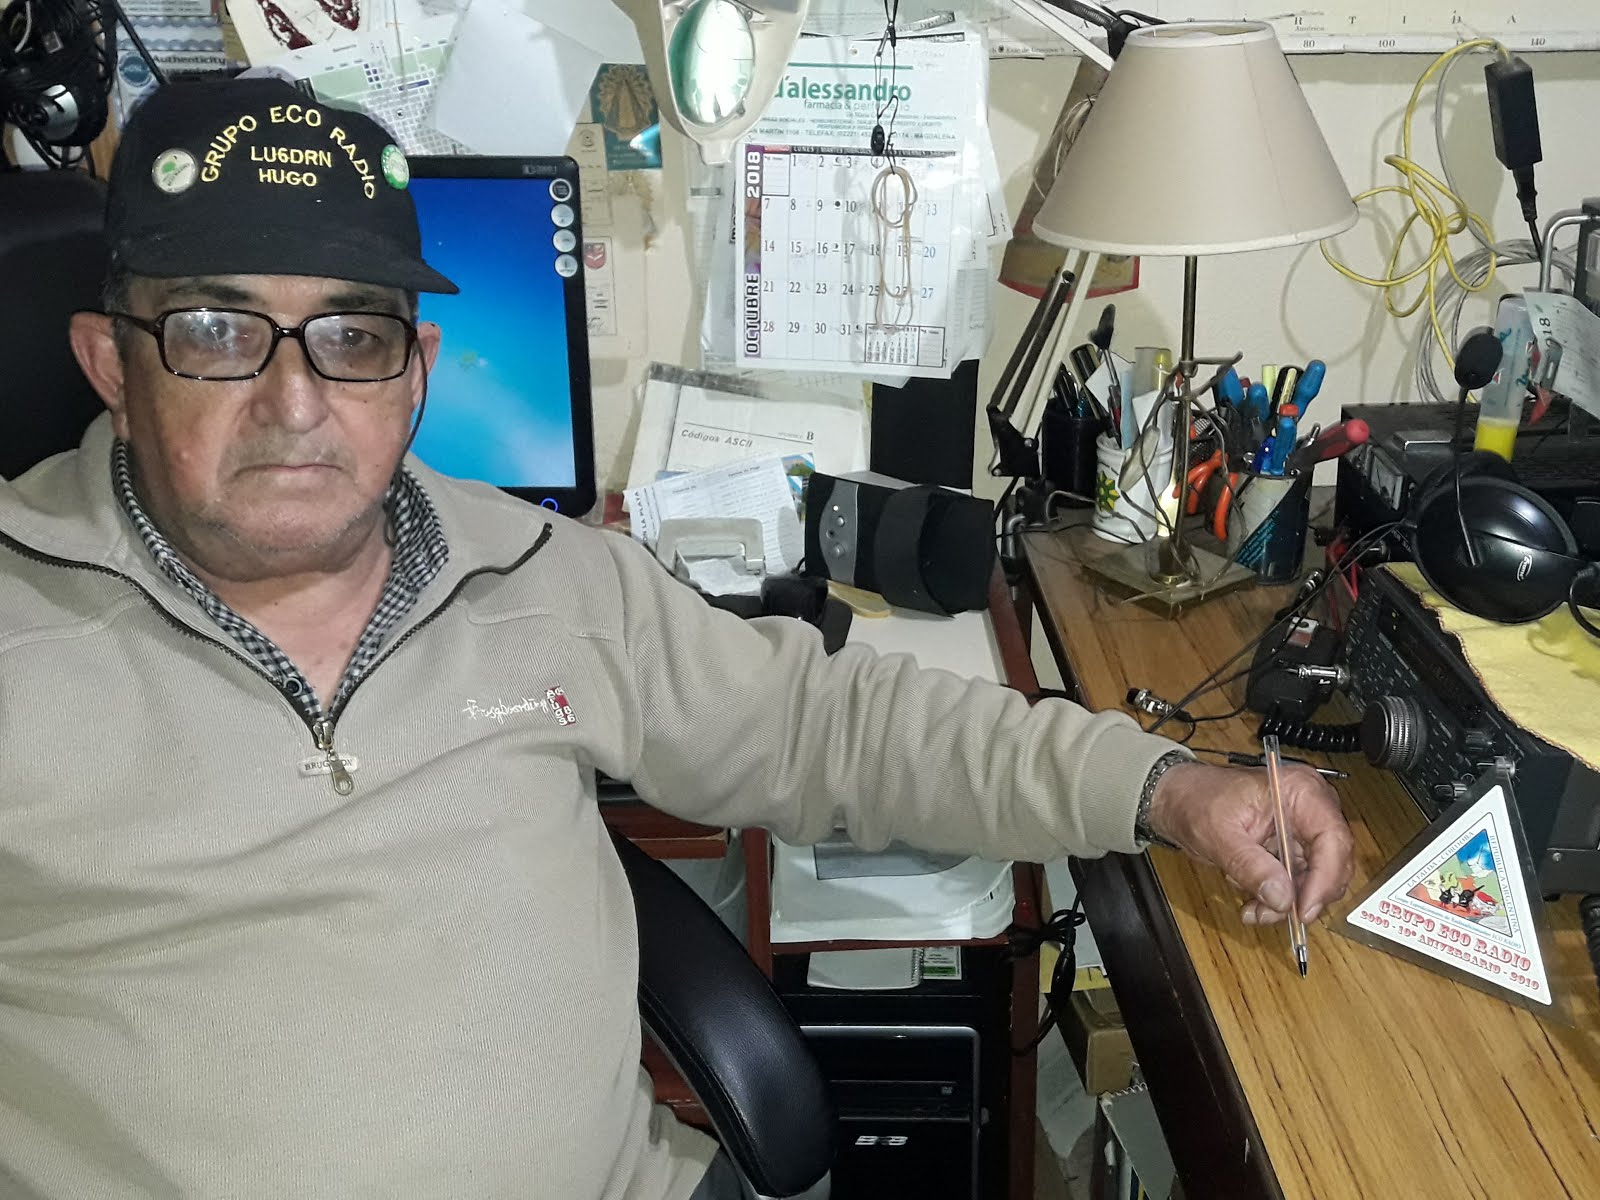 LU6DRN  Hugo Ricardo Manene